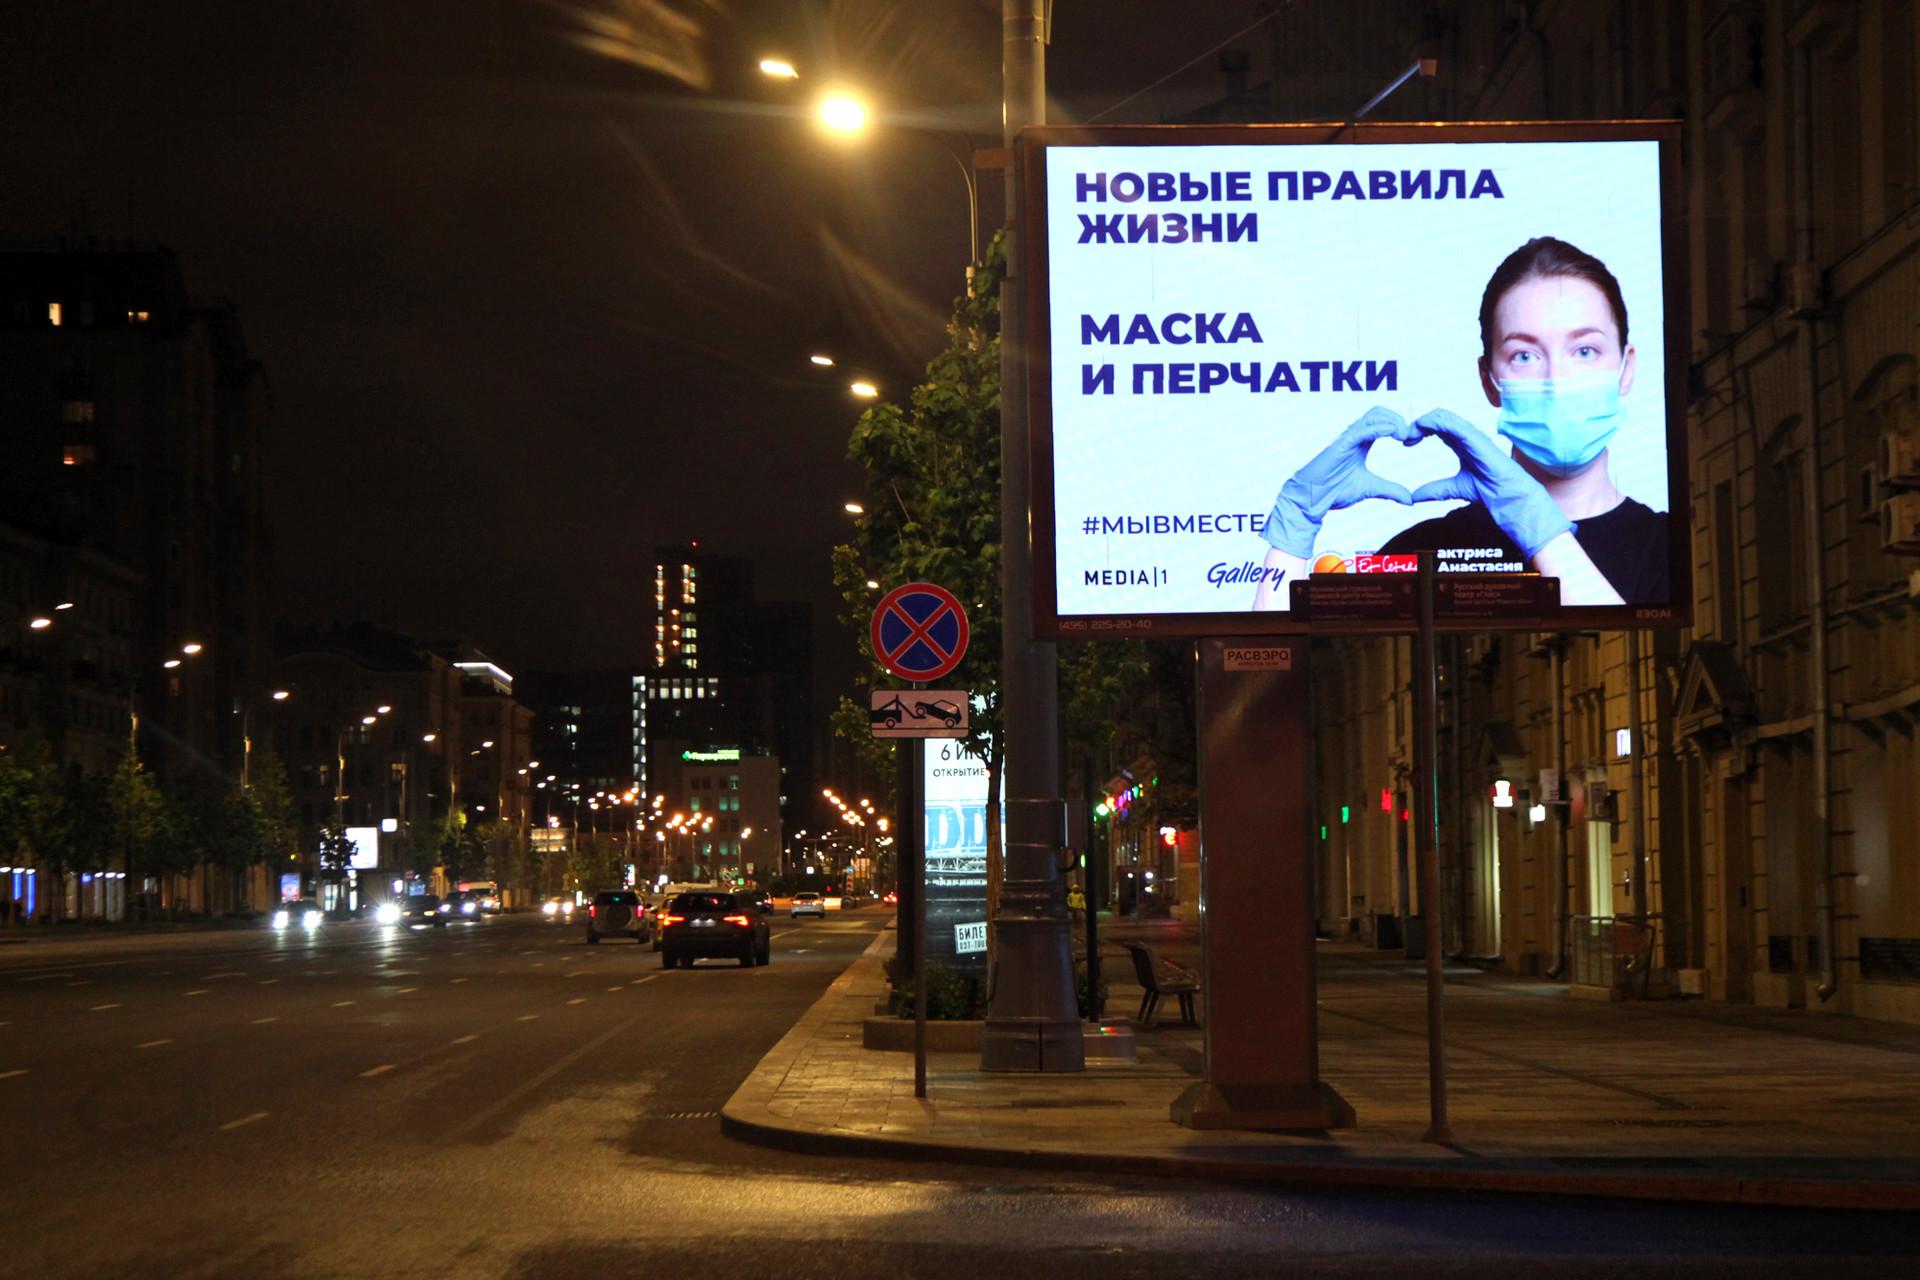 Iklan peringatan untuk mengenakan masker dan sarung tangan terpampang di daerah Sadovoye Koltso (Lingkar Taman). Pemerintah Moskow mewajibkan penggunaan masker dan sarung tangan saat bepergian ke luar.